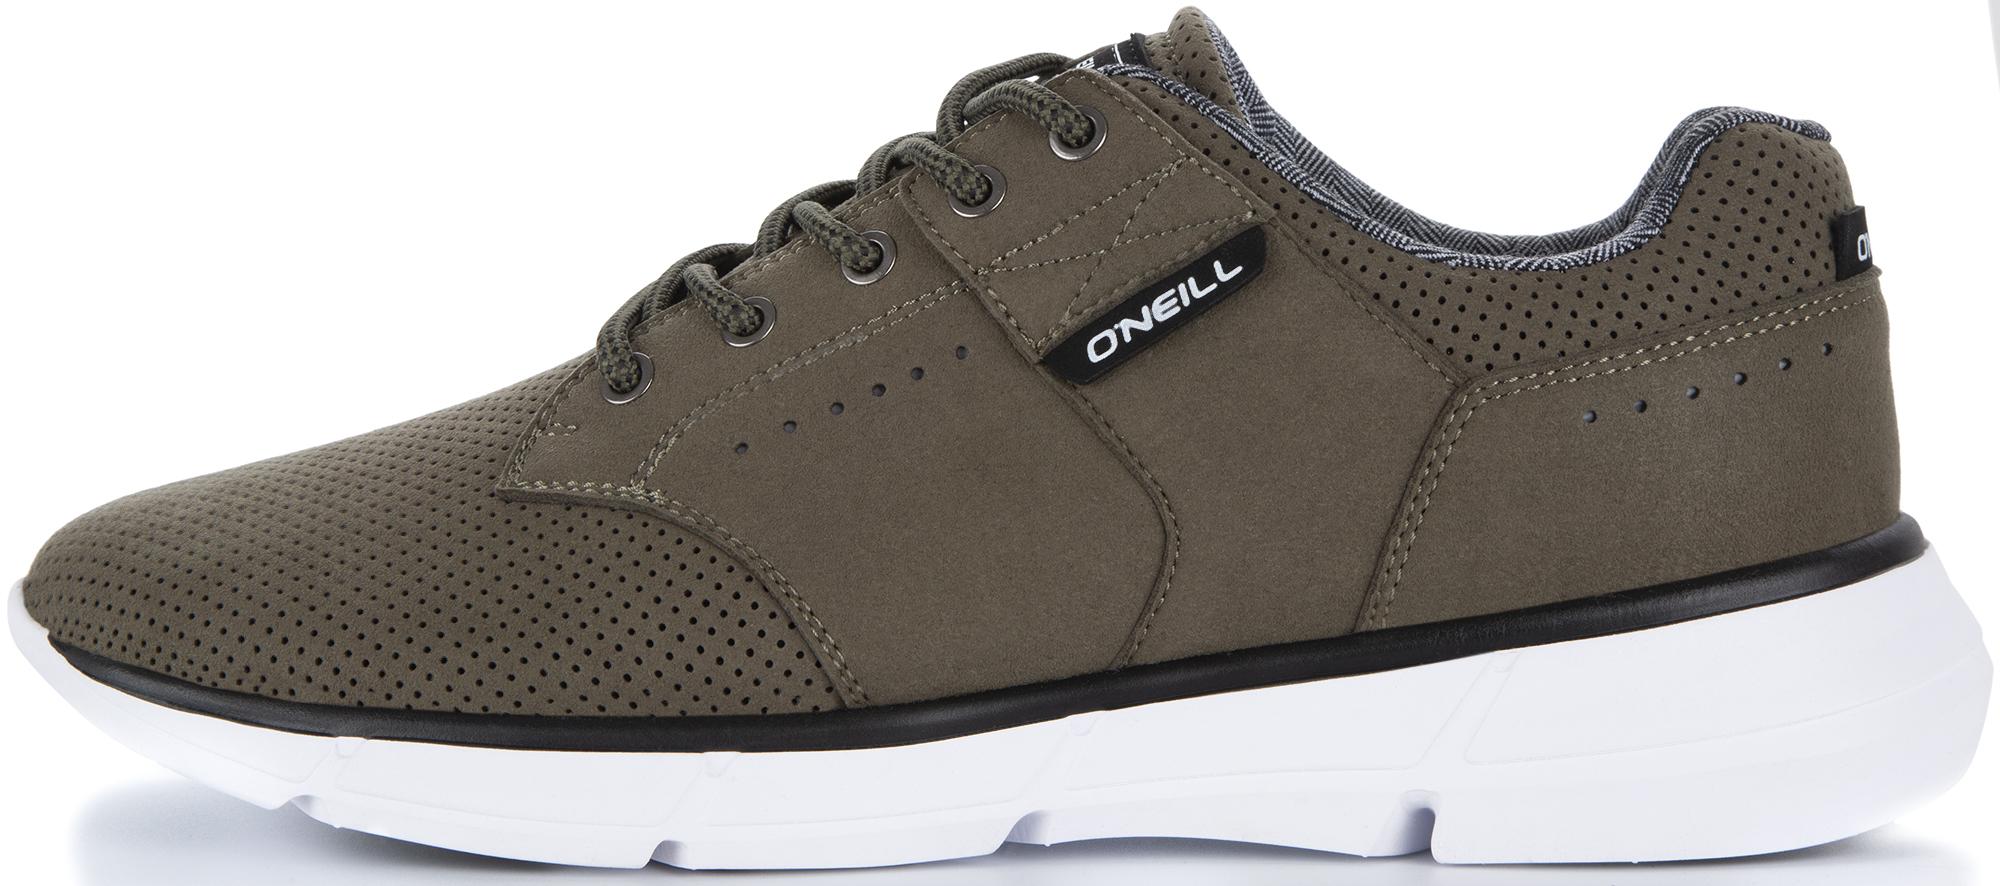 цена O'Neill Полуботинки мужские O'Neill Mavericks LT, размер 40 онлайн в 2017 году